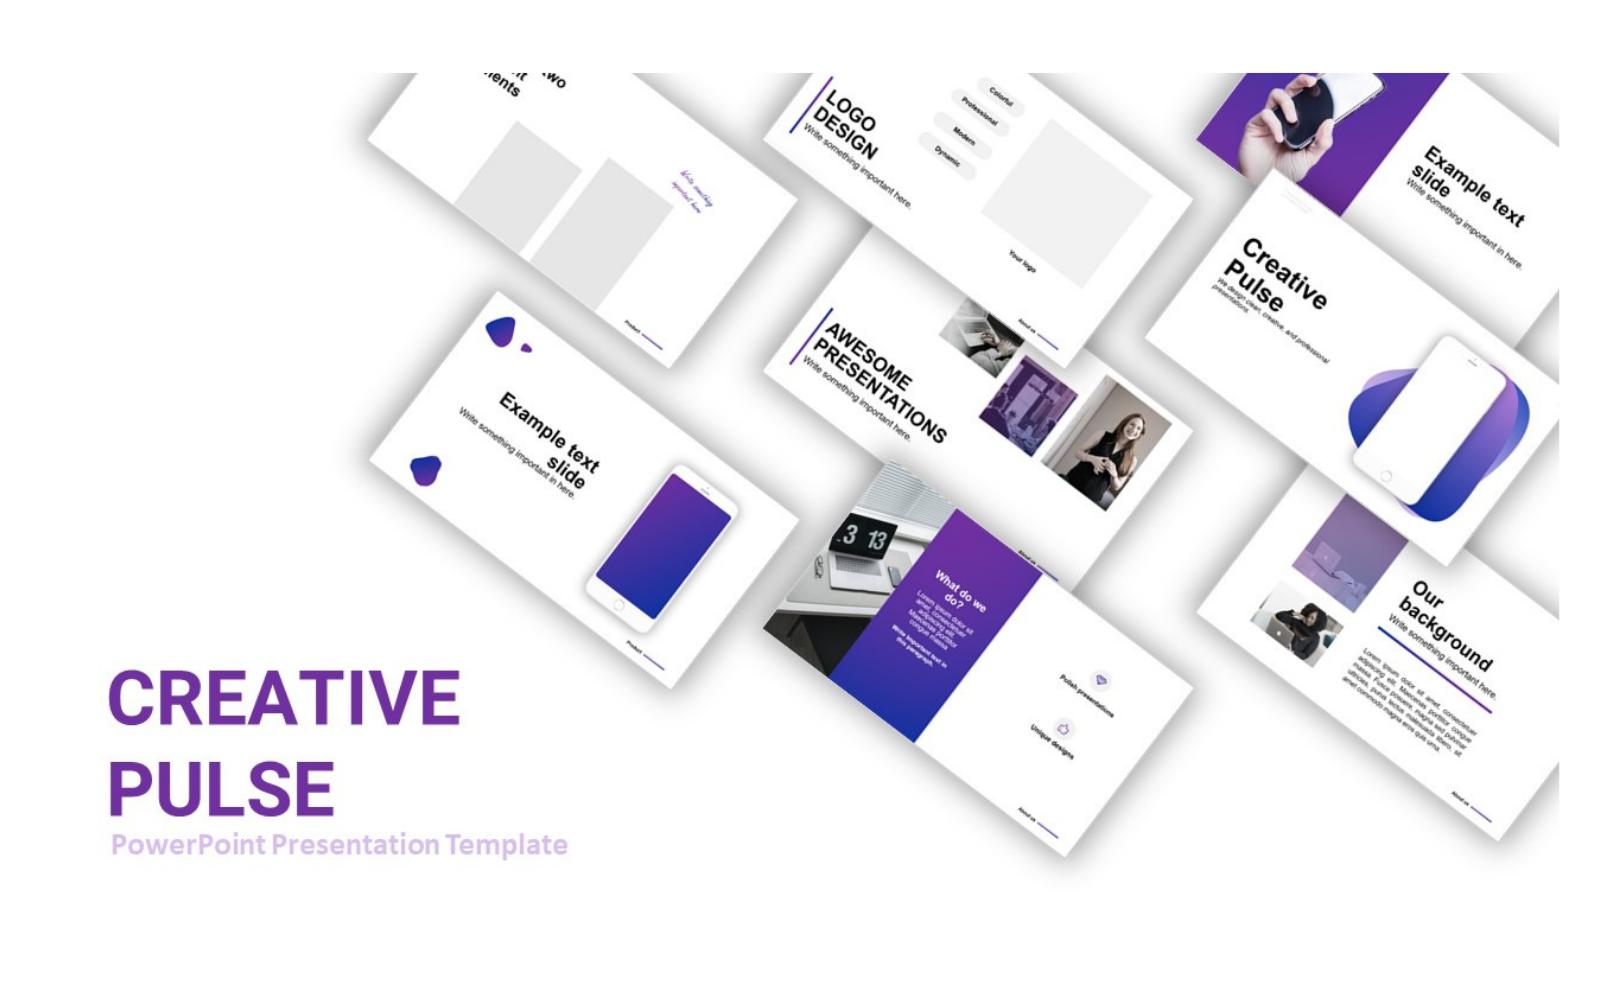 CreativePulse Presentation PowerPoint Template